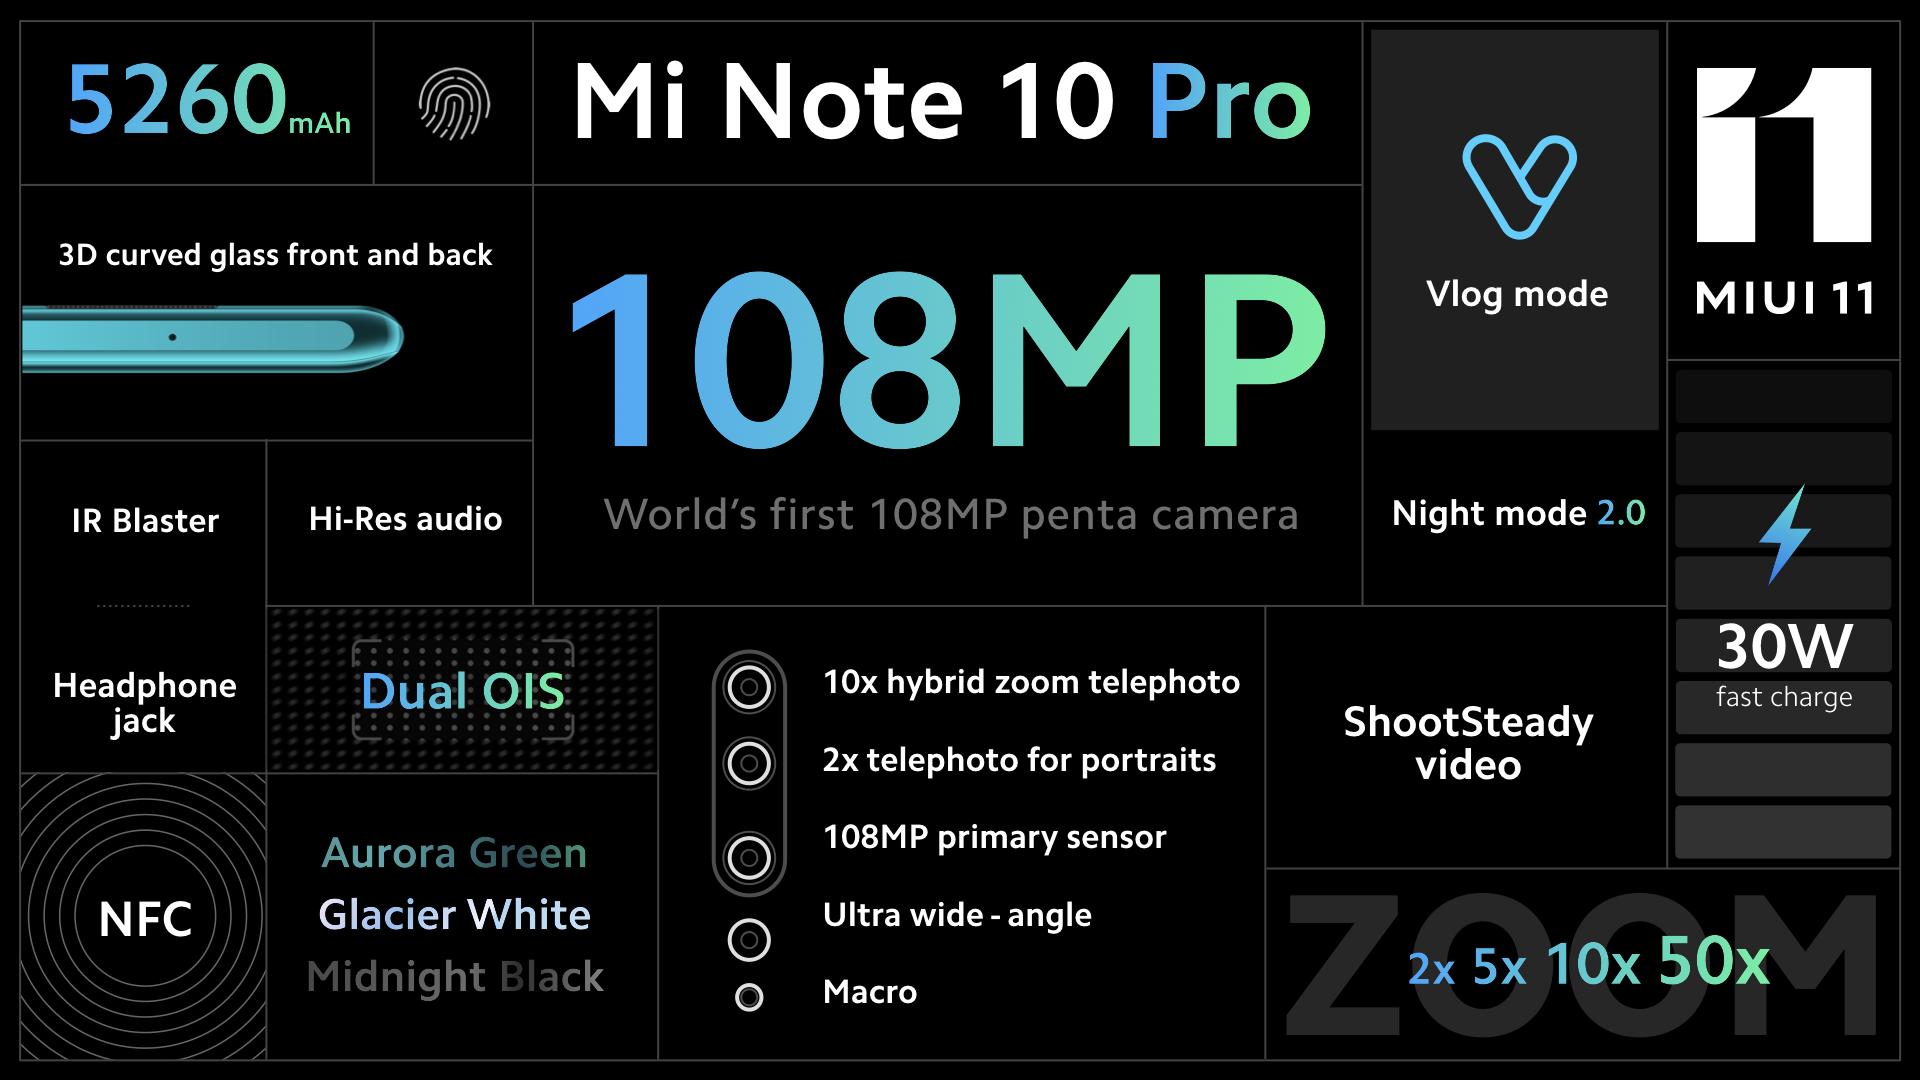 Spesifikasi Mi Note 10 Pro